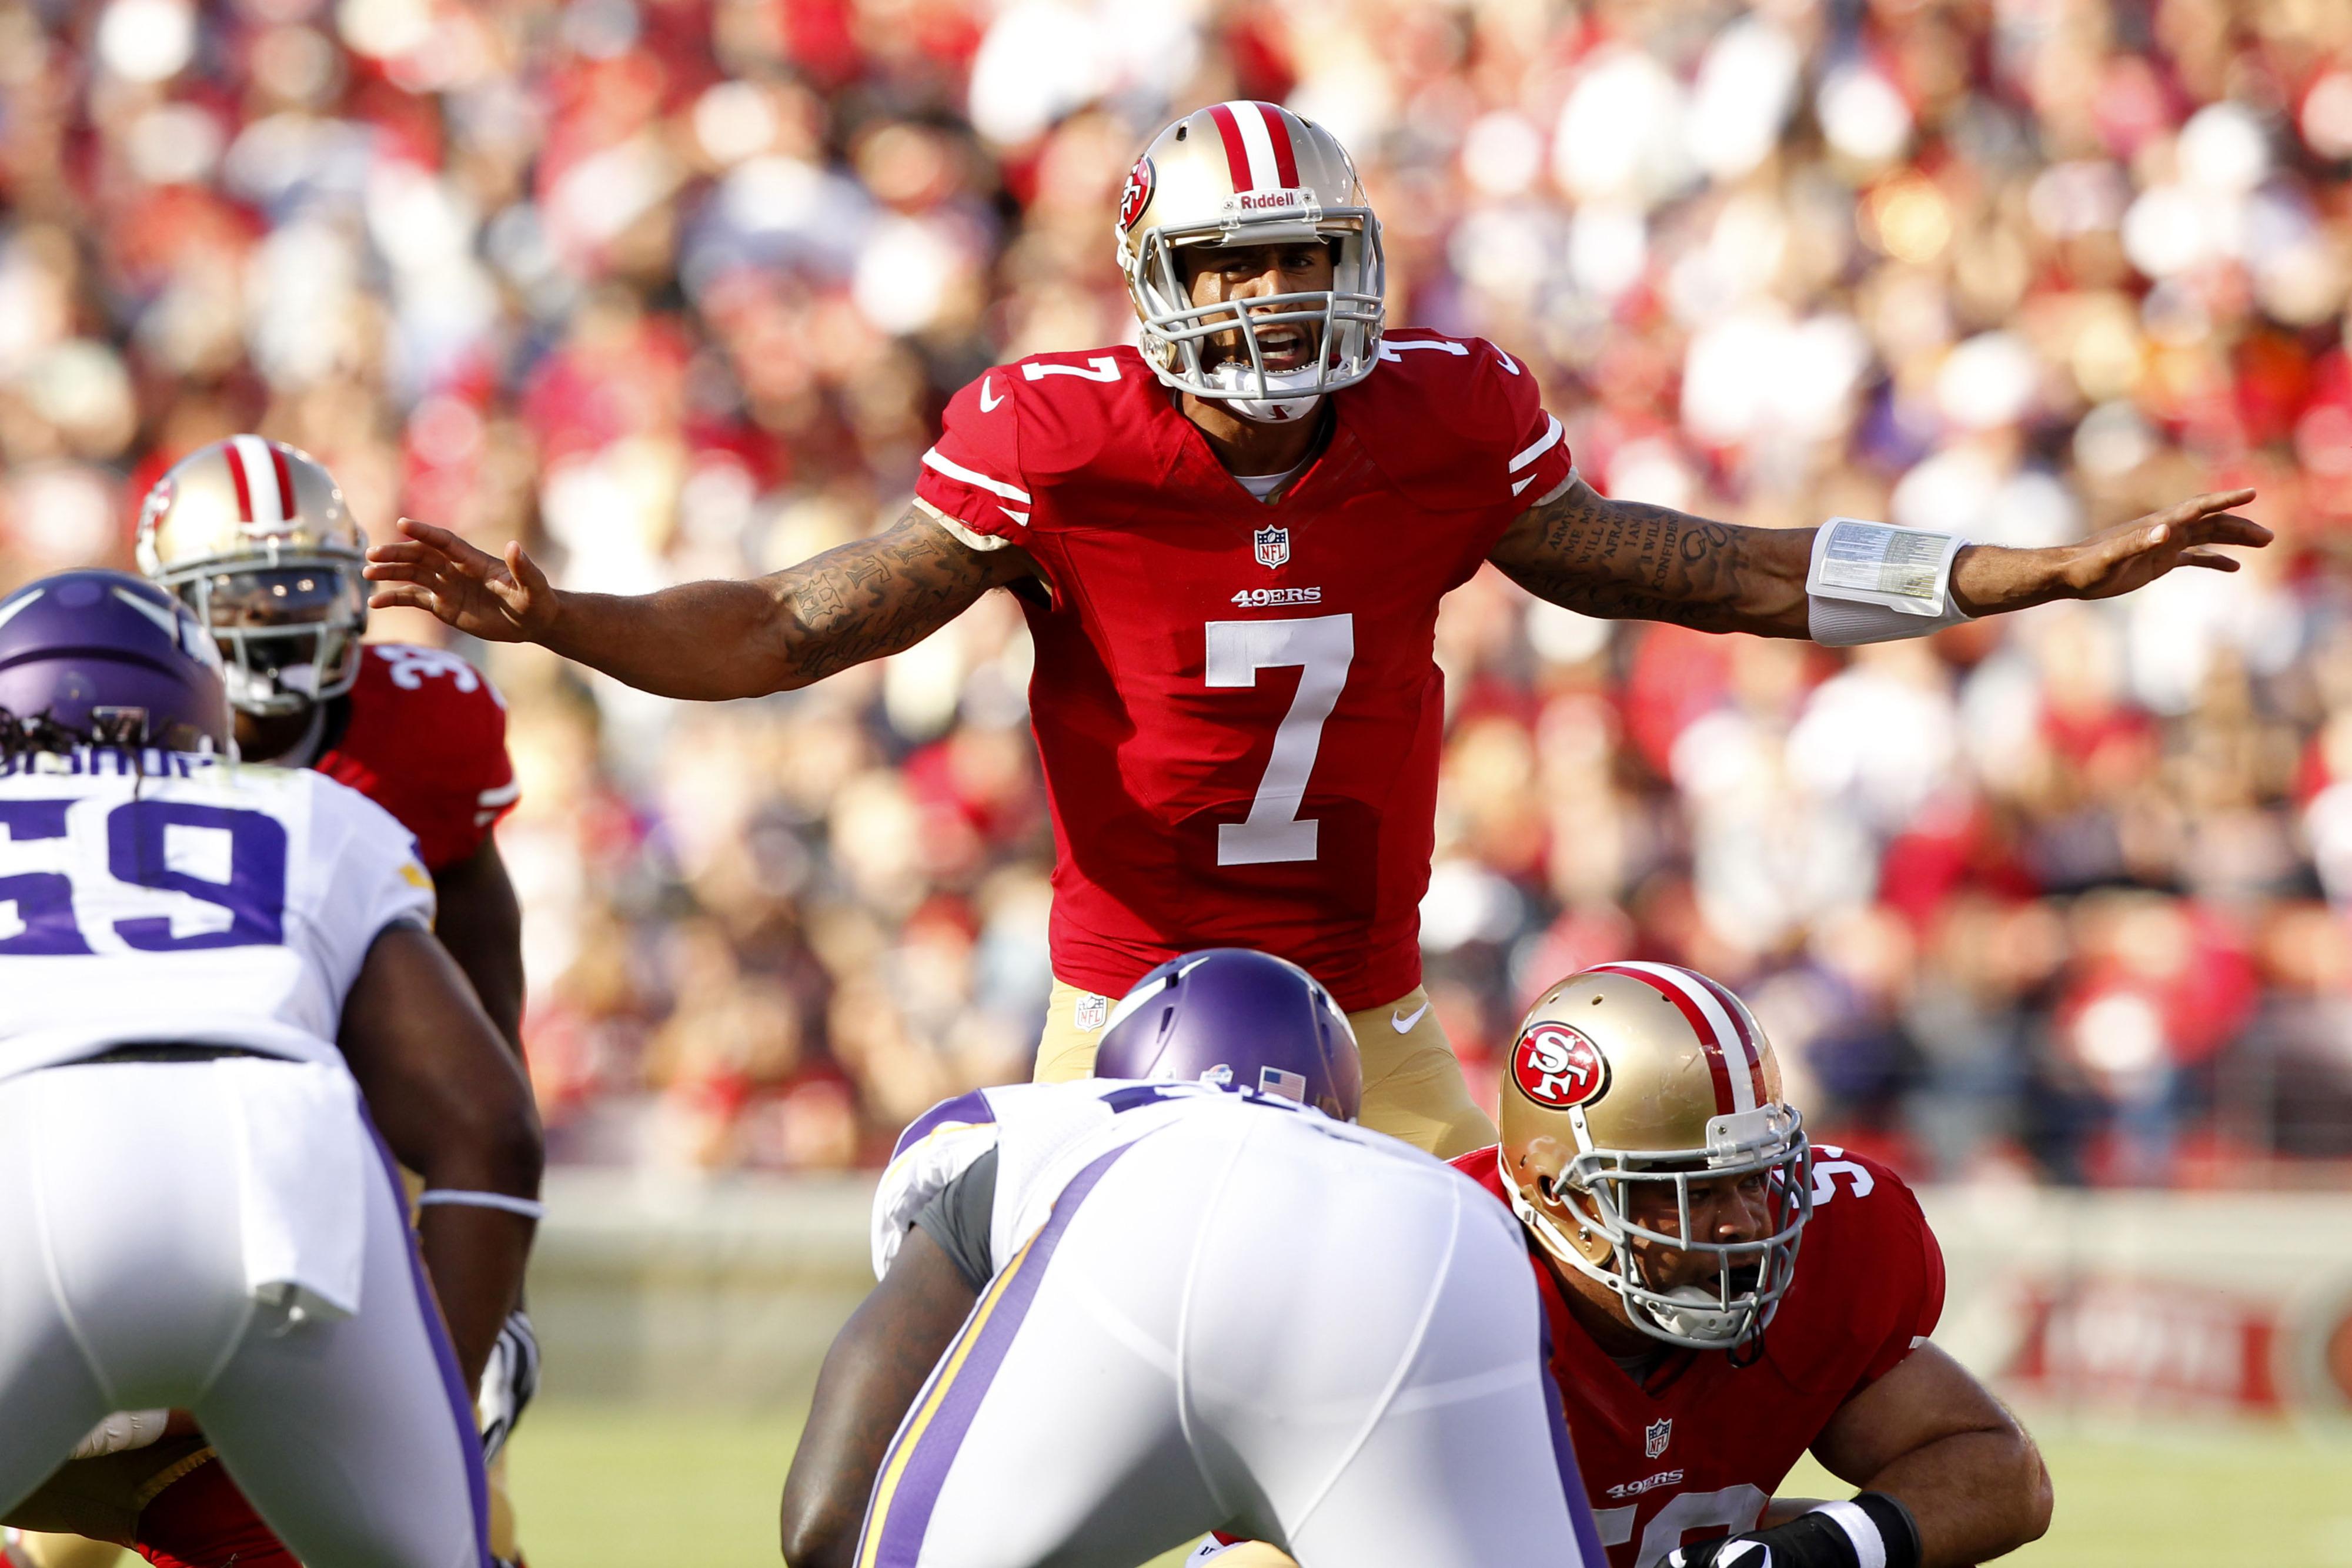 Vikings vs. 49ers final score: San Francisco wins 34-14